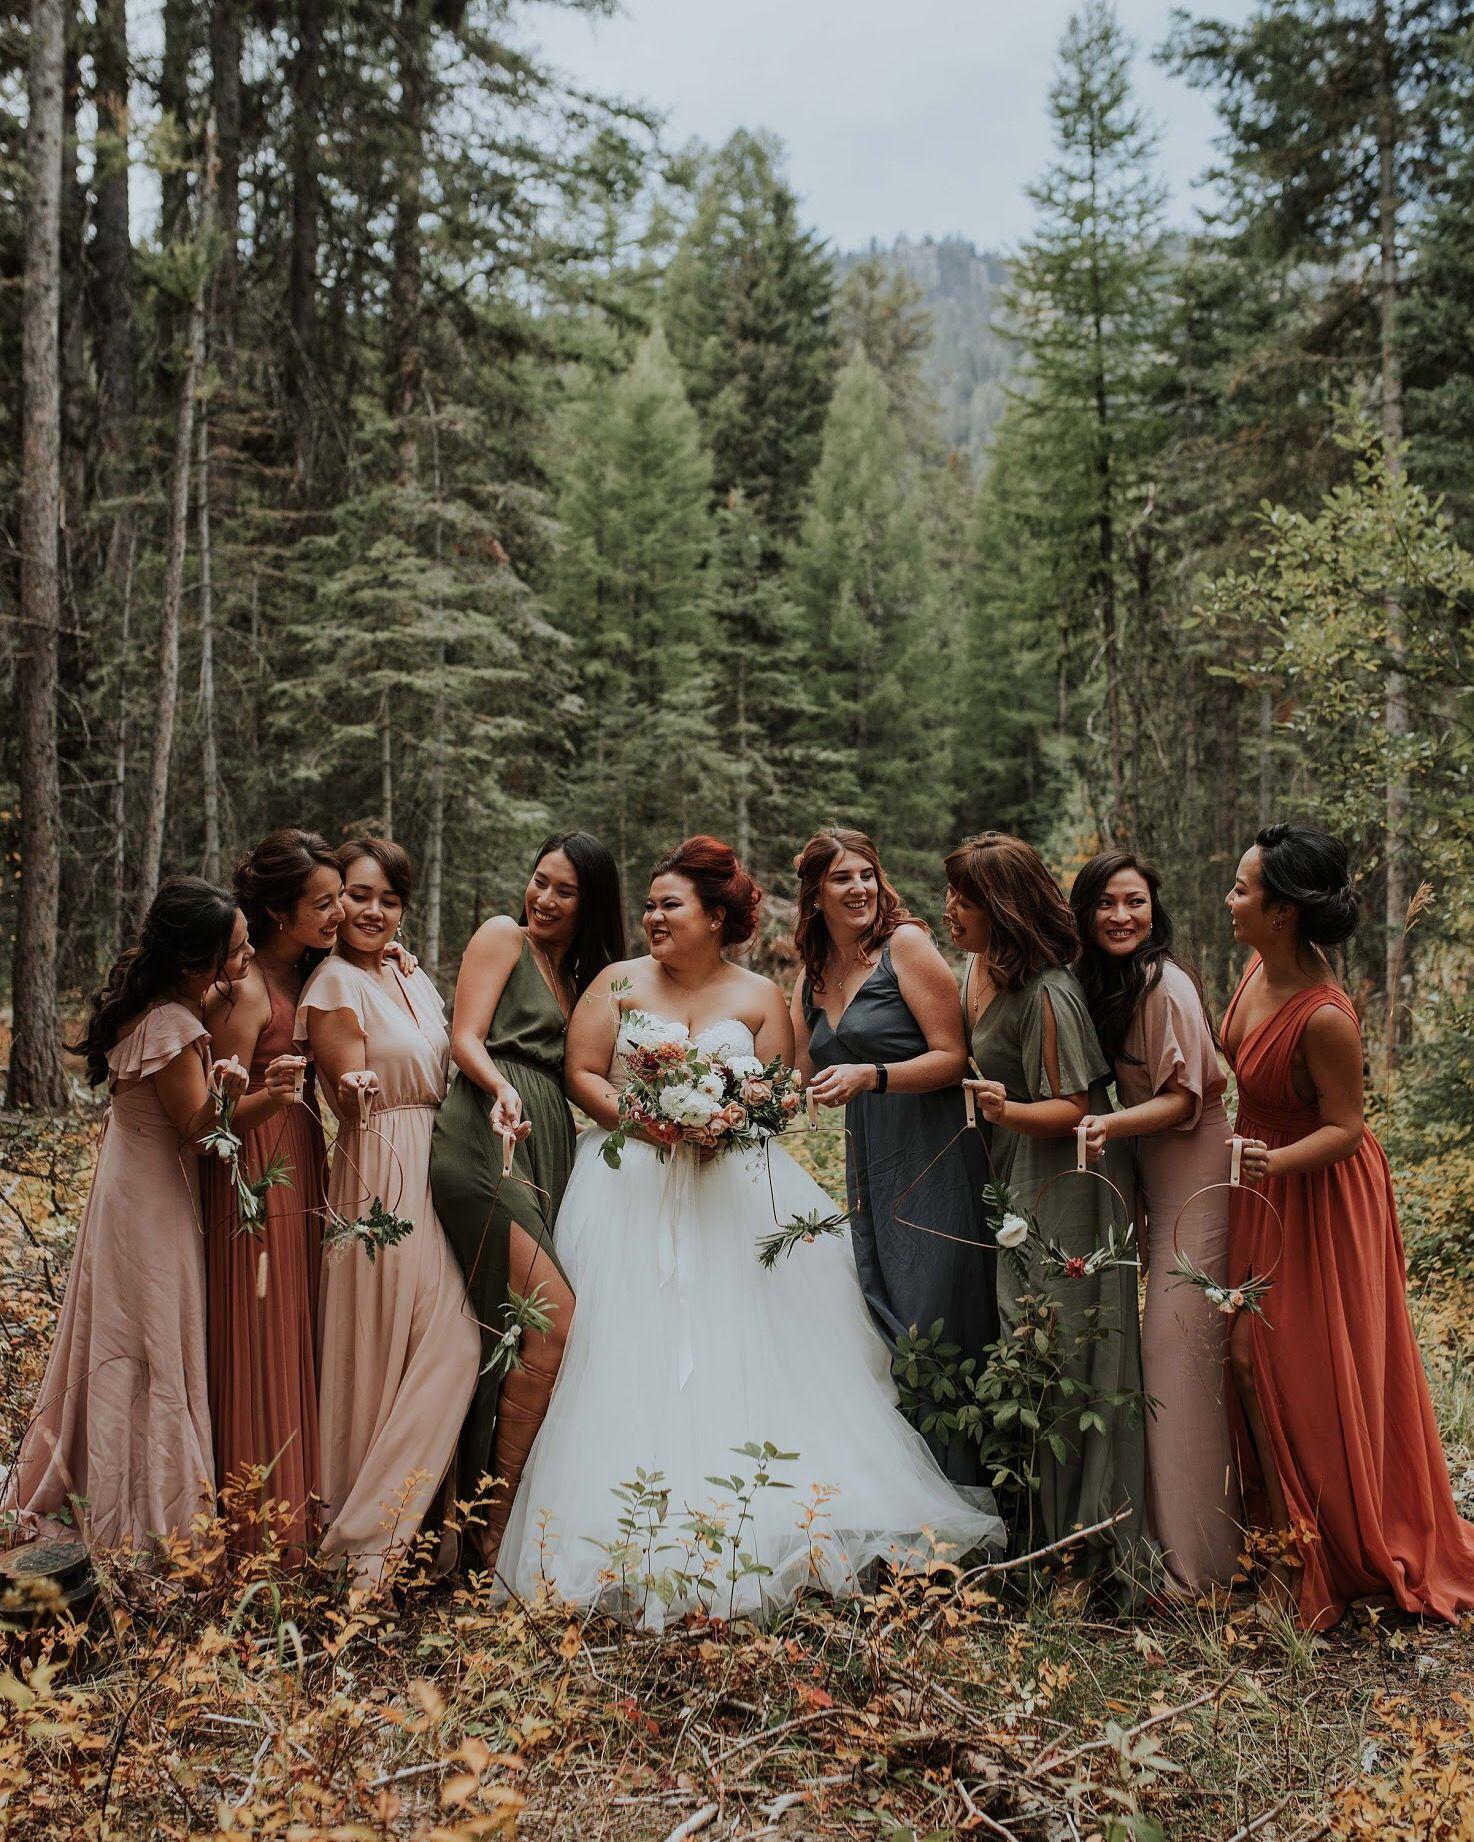 Idaho Boho Fall Wedding Emily Aitken Events Fall Bridesmaid Dresses Wedding Bridesmaid Dresses Fall Bridesmaids